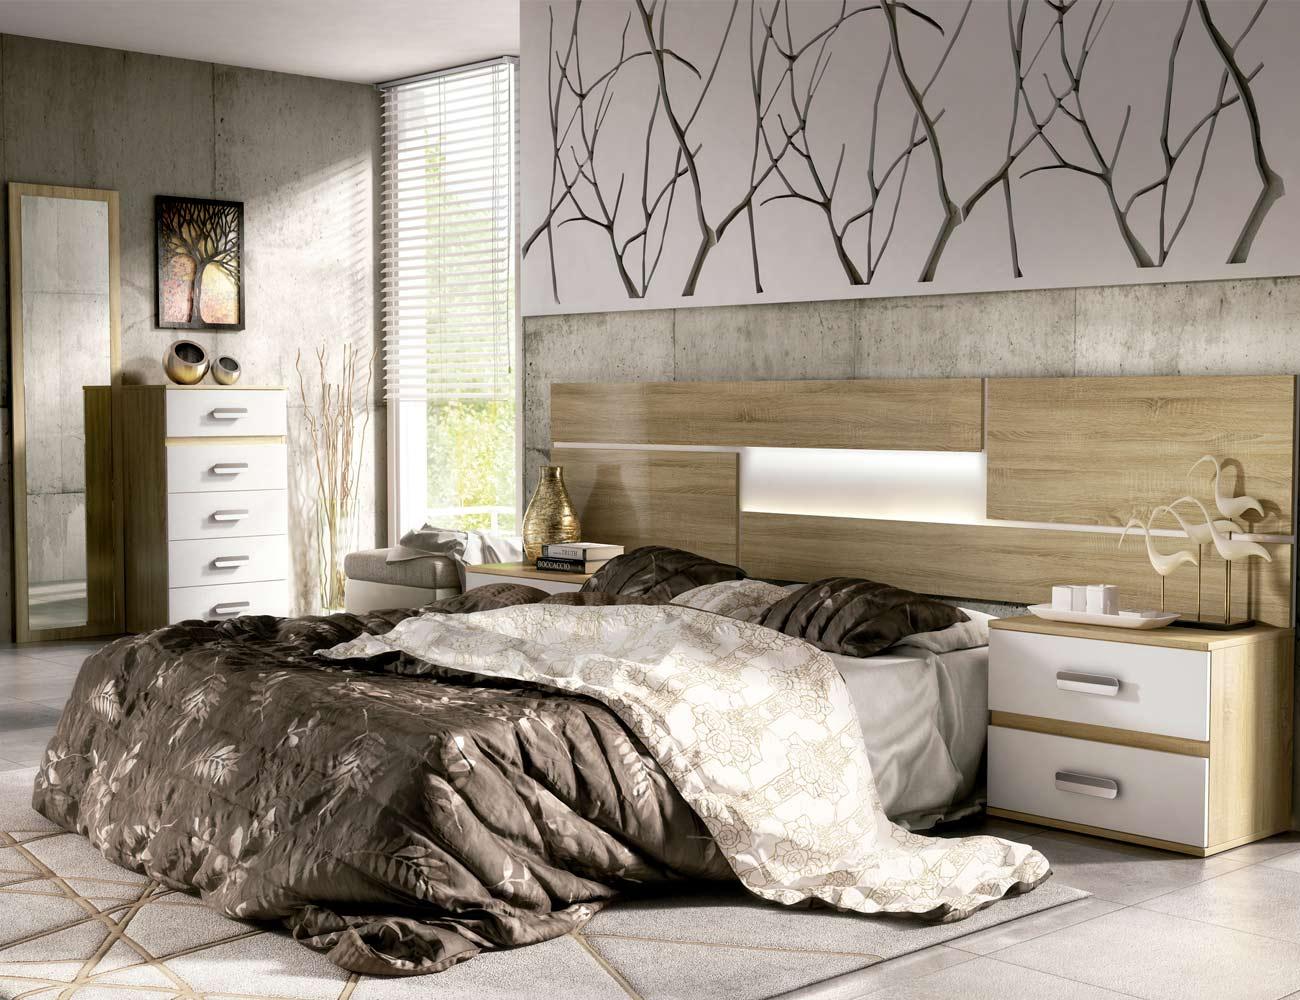 09 dormitorio matrimonio cabecero luces leds sinfonier mural cambrian blanco